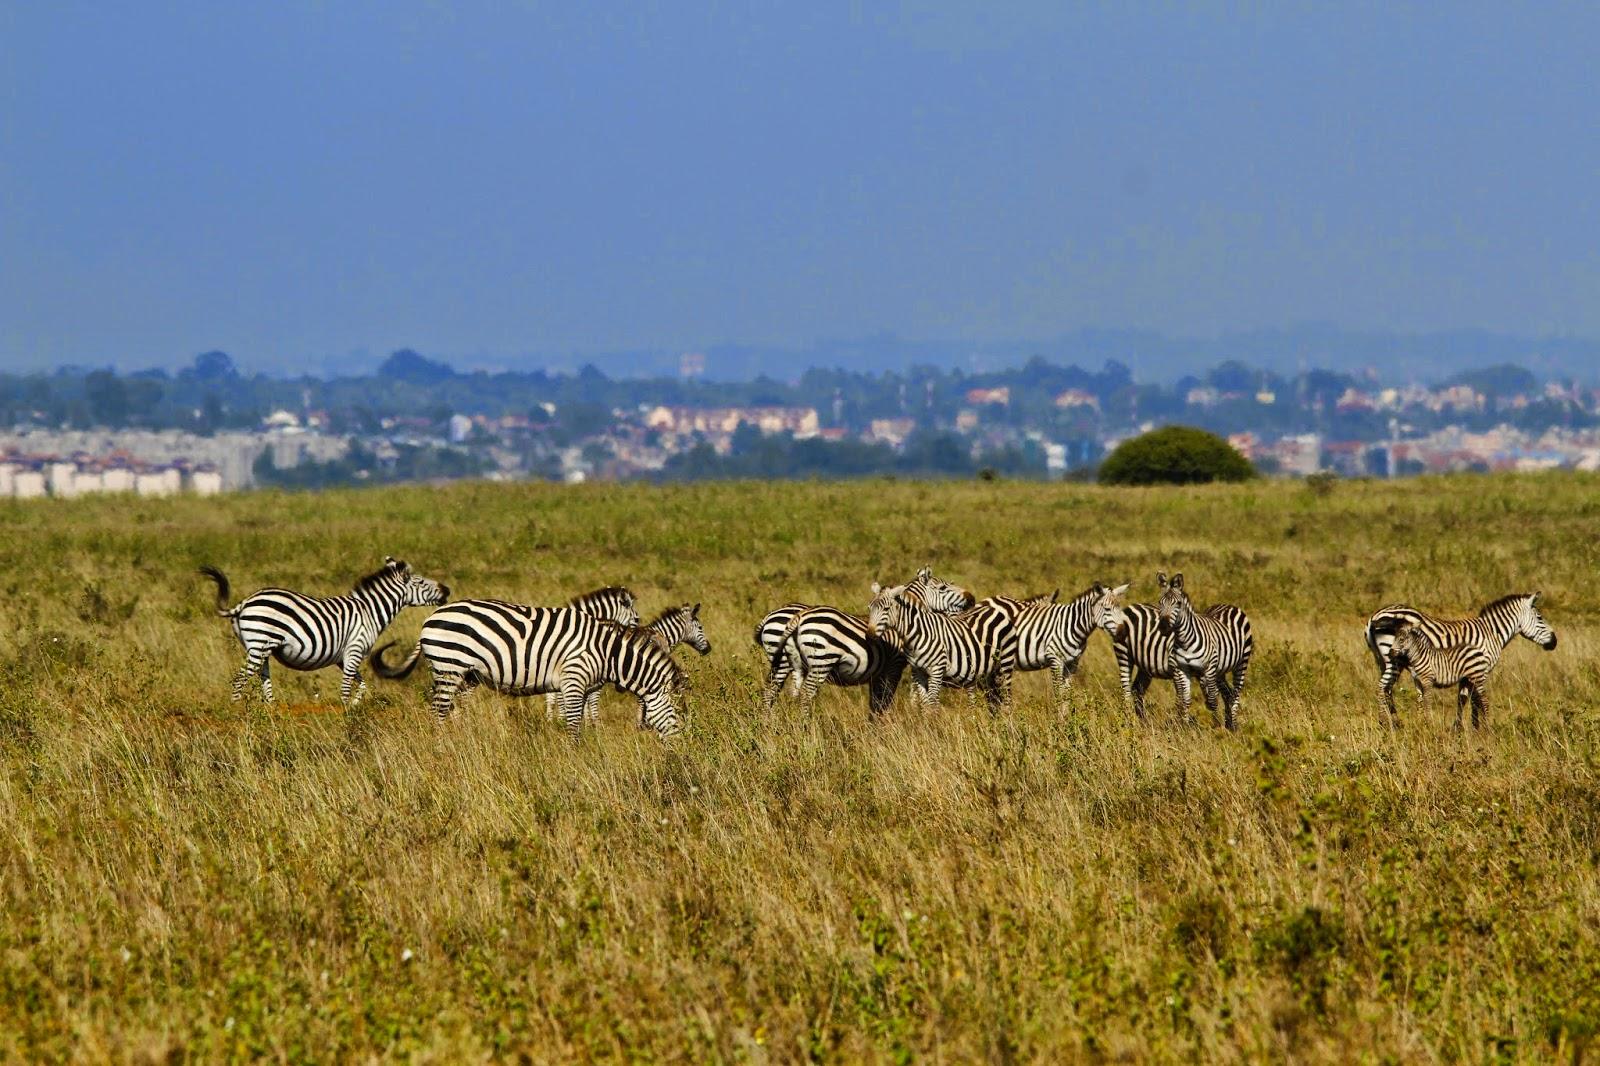 PARQUE NACIONAL DE NAIROBI - Savana junto à selva urbana   Quénia